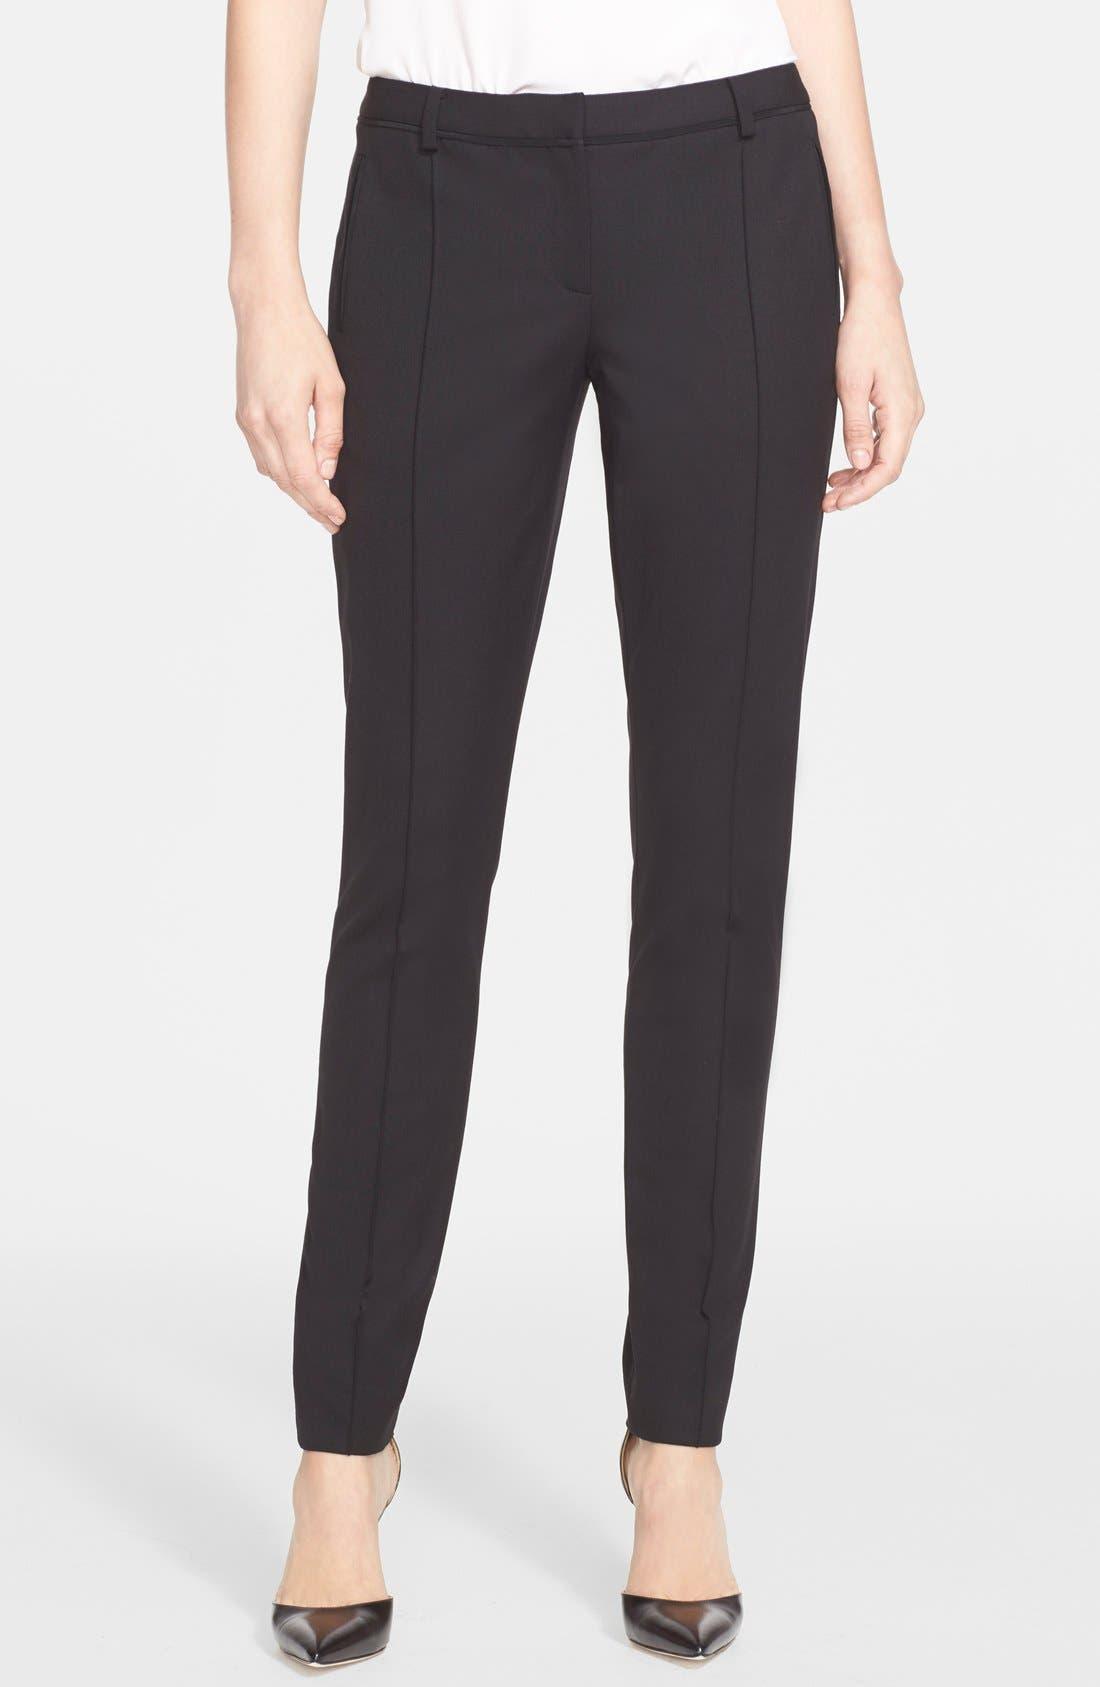 Alternate Image 1 Selected - Jason Wu Stretch Gabardine Crop Pants